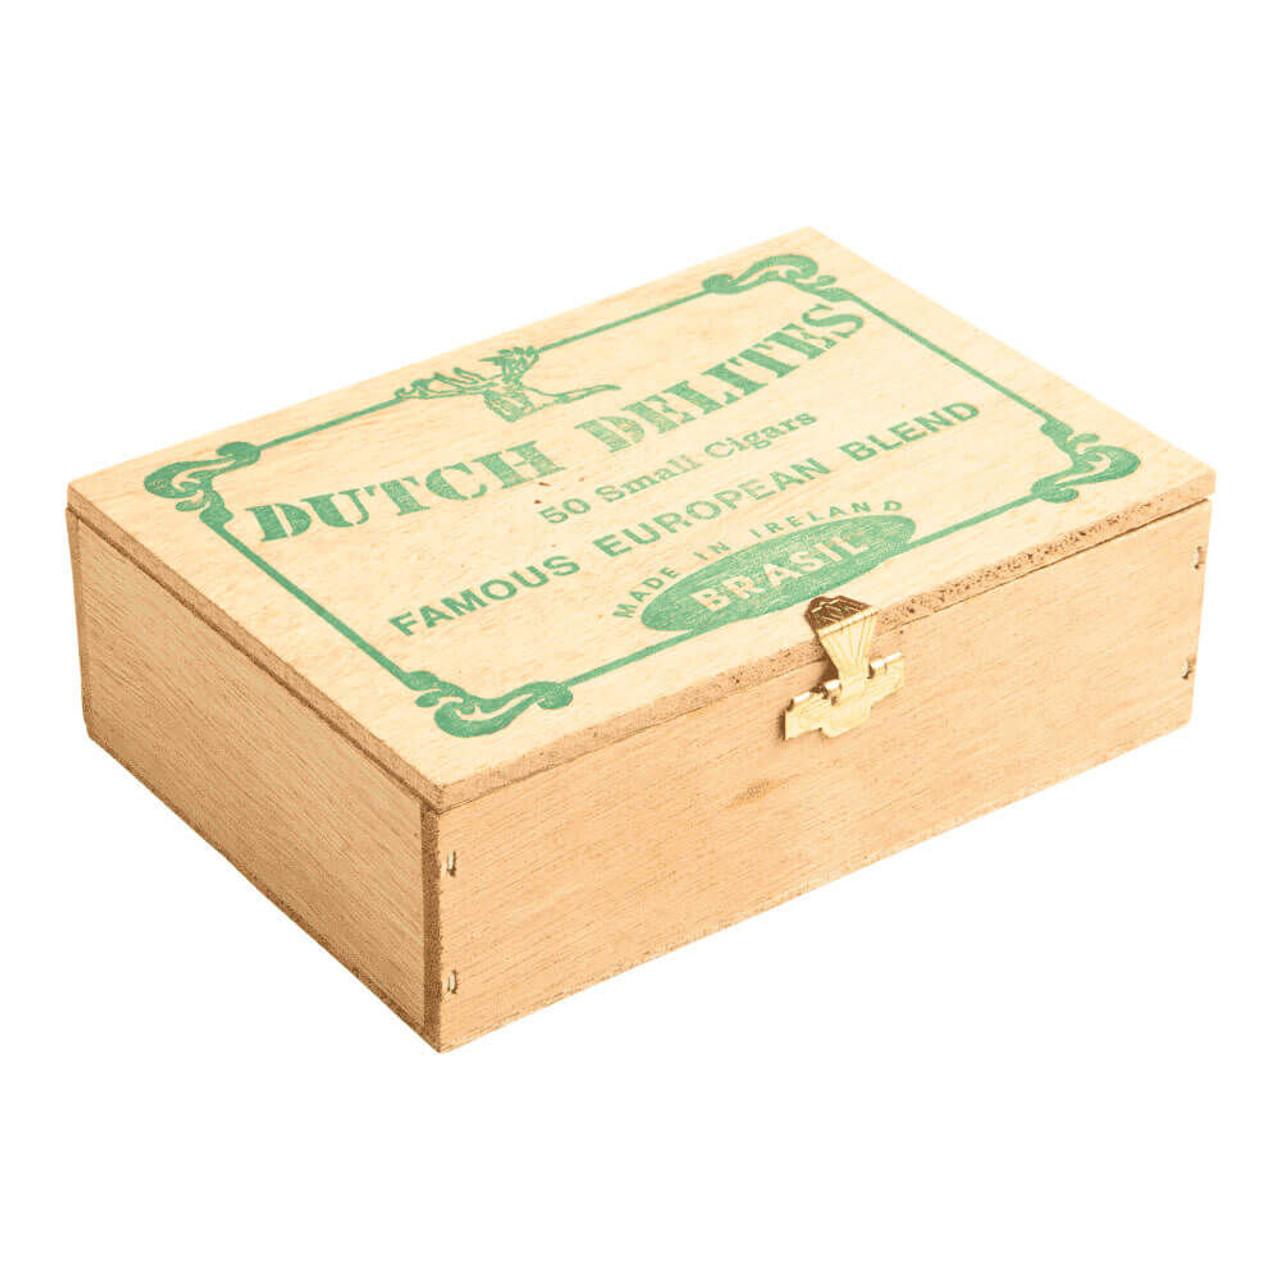 Dutch Delites Classic Brazil Cigars - 5 x 30 (Box of 50)